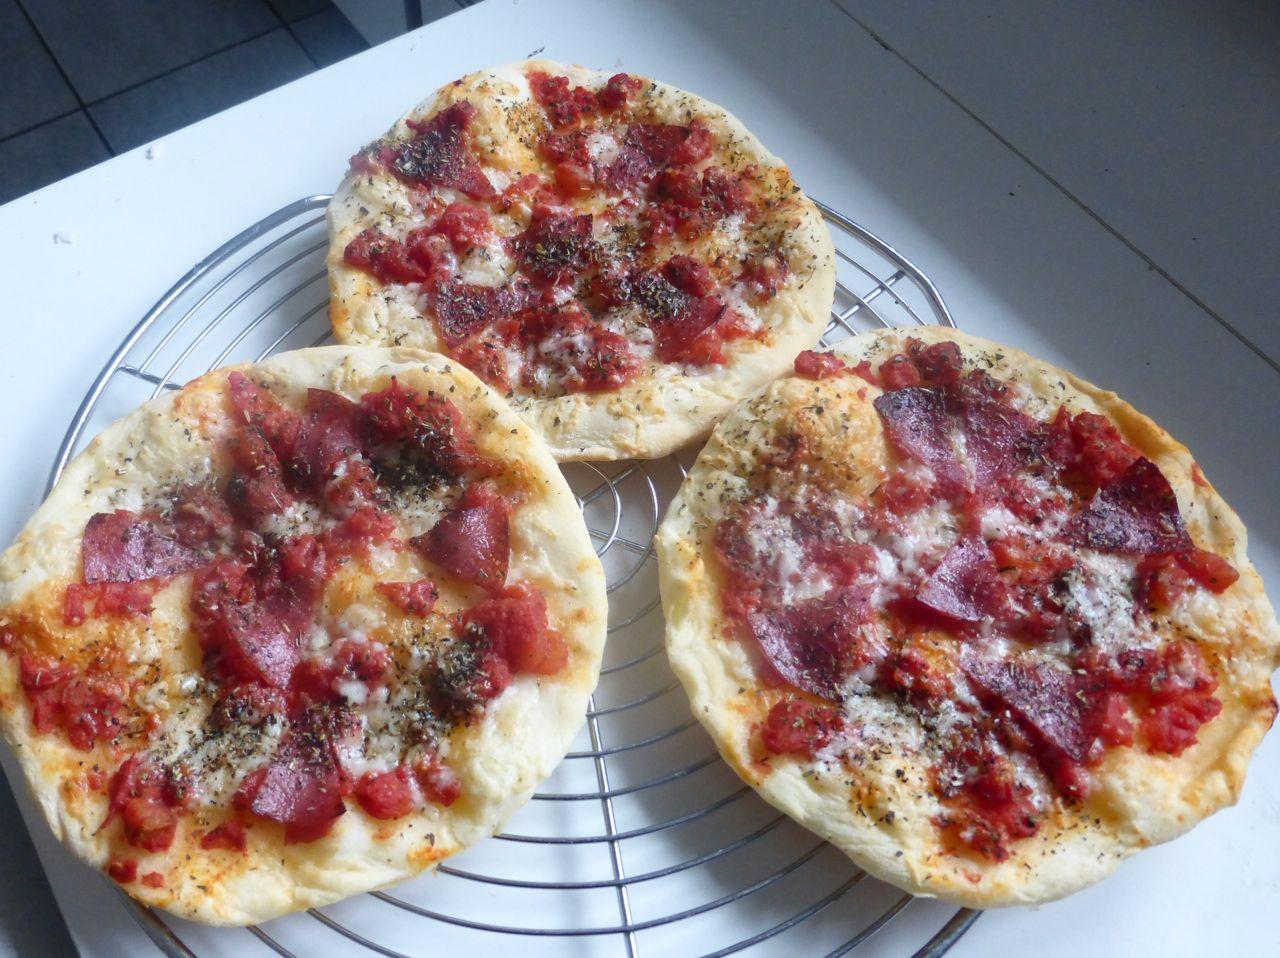 Pizza Mit Quark ölteig Trudels Glutenfreies Kochbuch